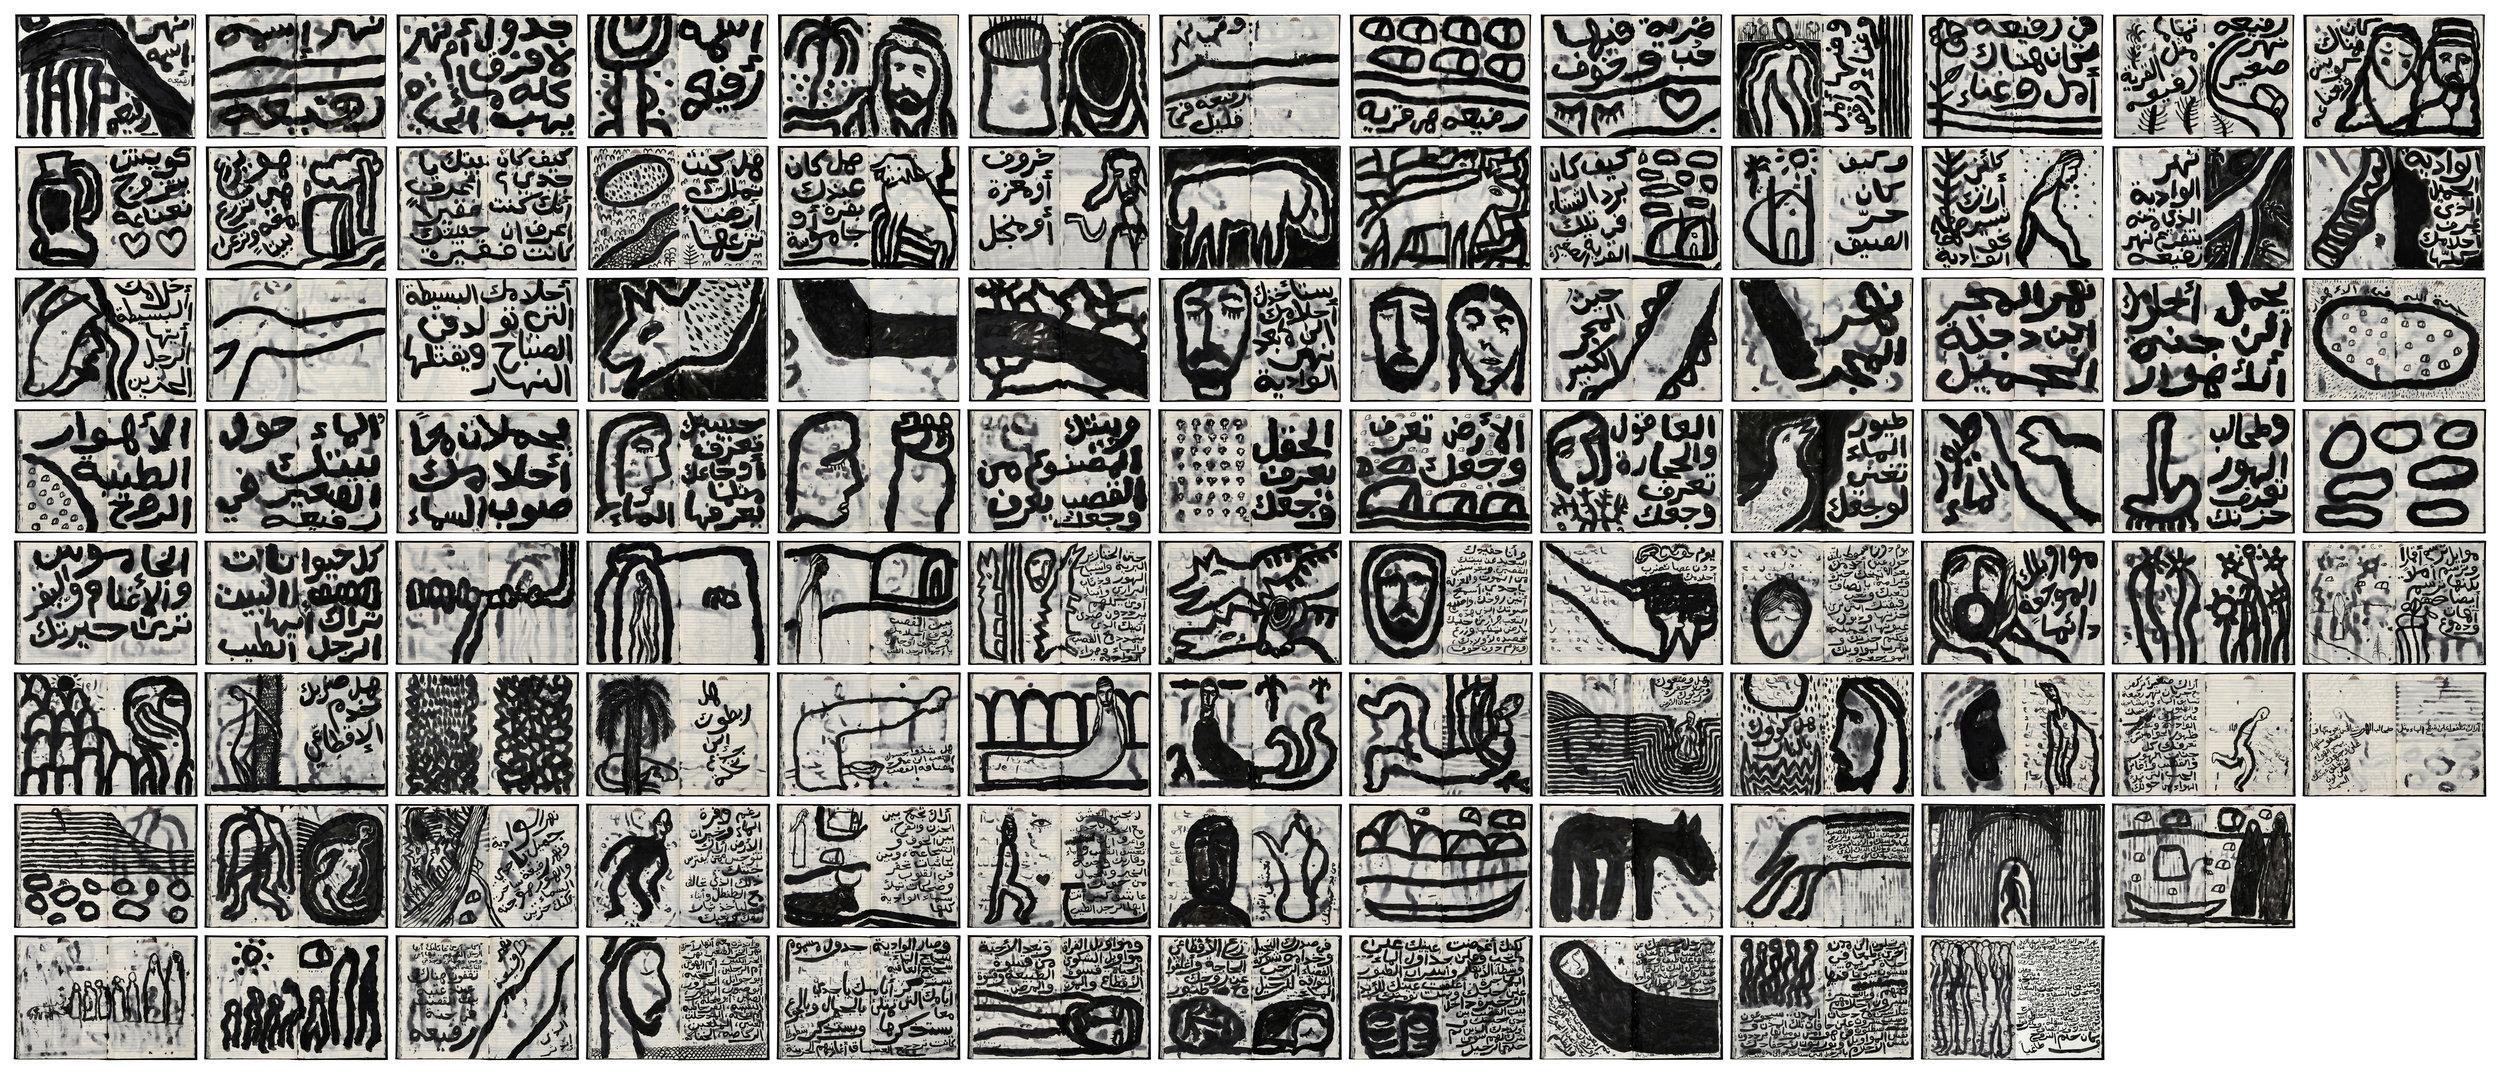 Sadik Kwaish Alfraji: Rivers Book 1 (2018). Image courtesy of Ayyam Gallery.